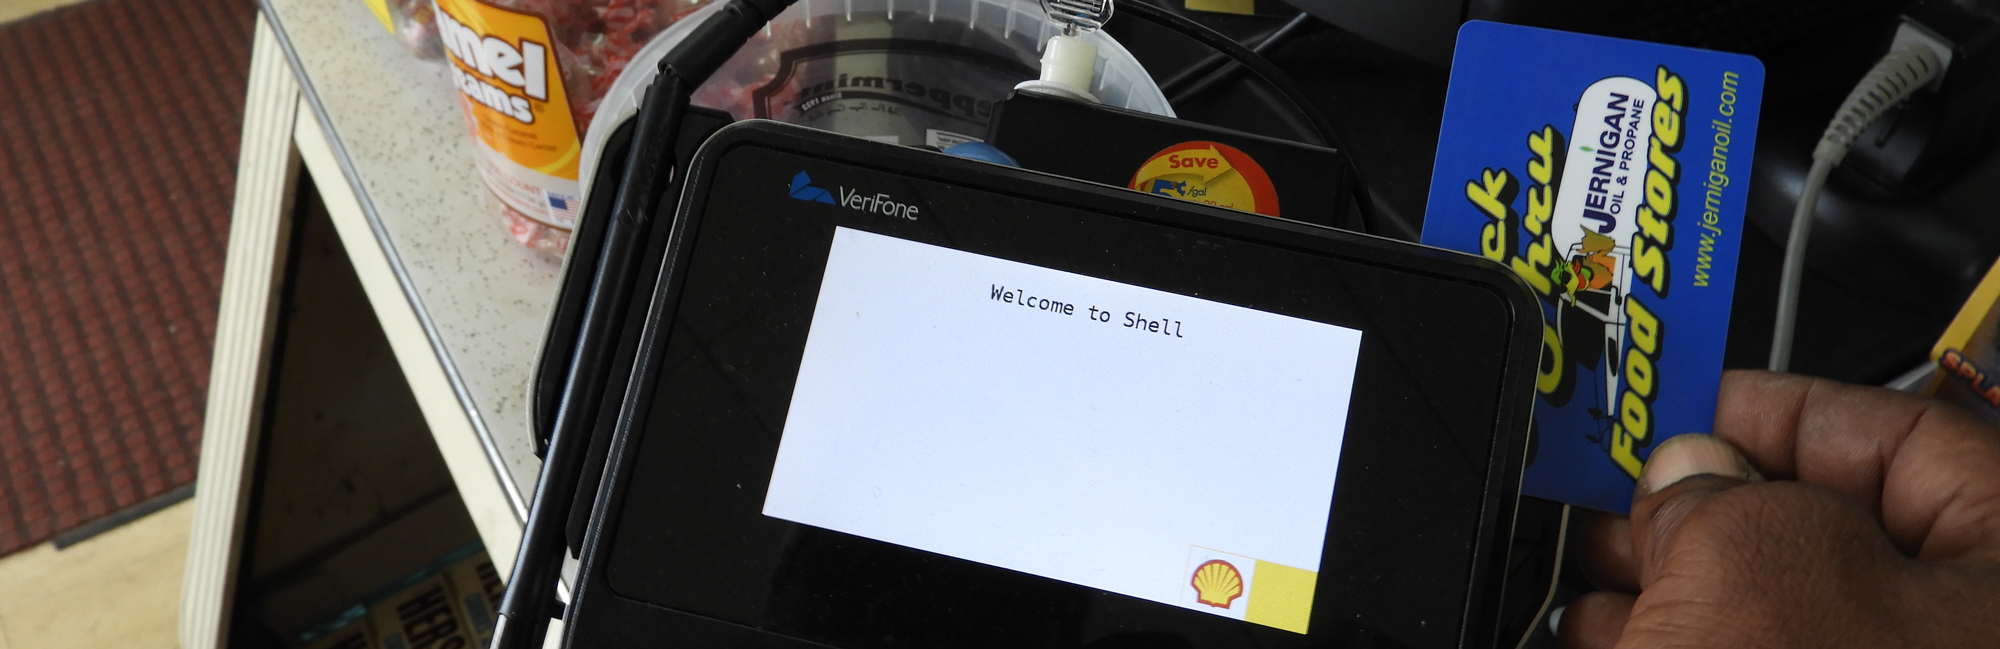 Fleet Fueling Card